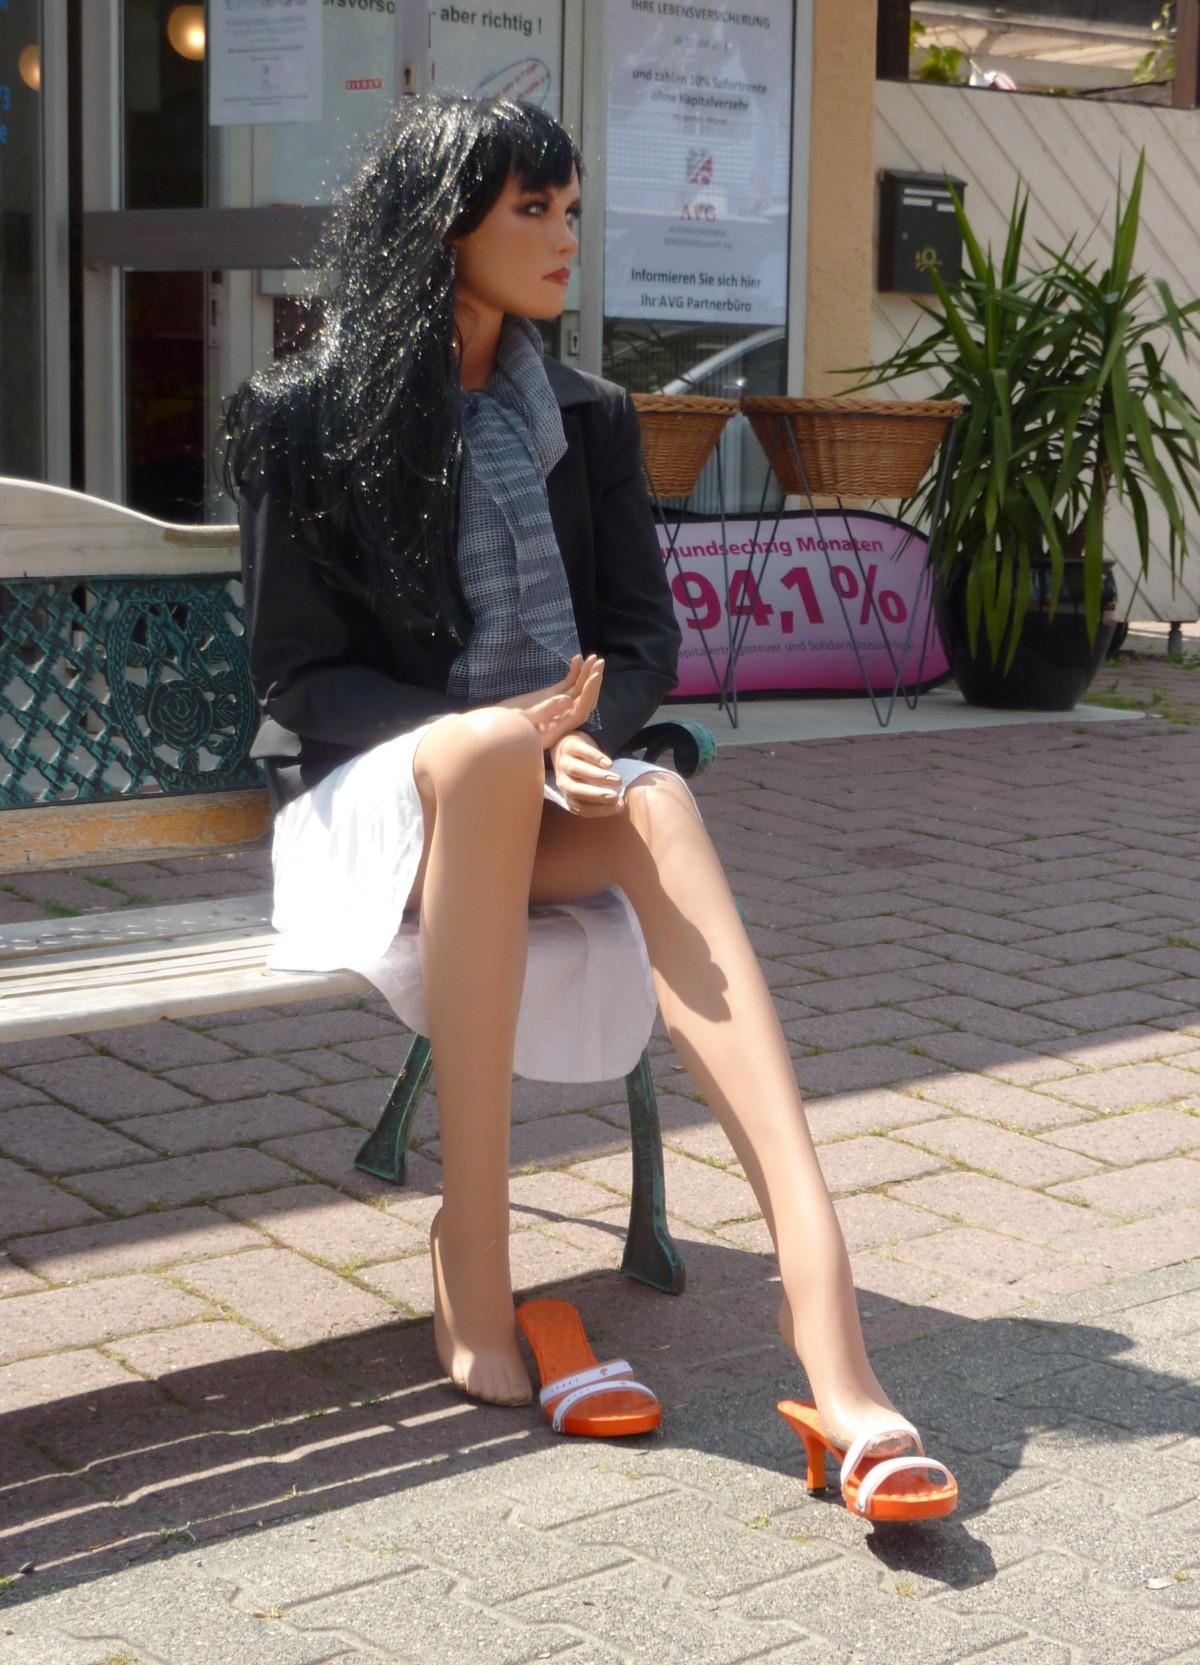 Free Images Shoe Woman Bench Leg Pattern Sitting